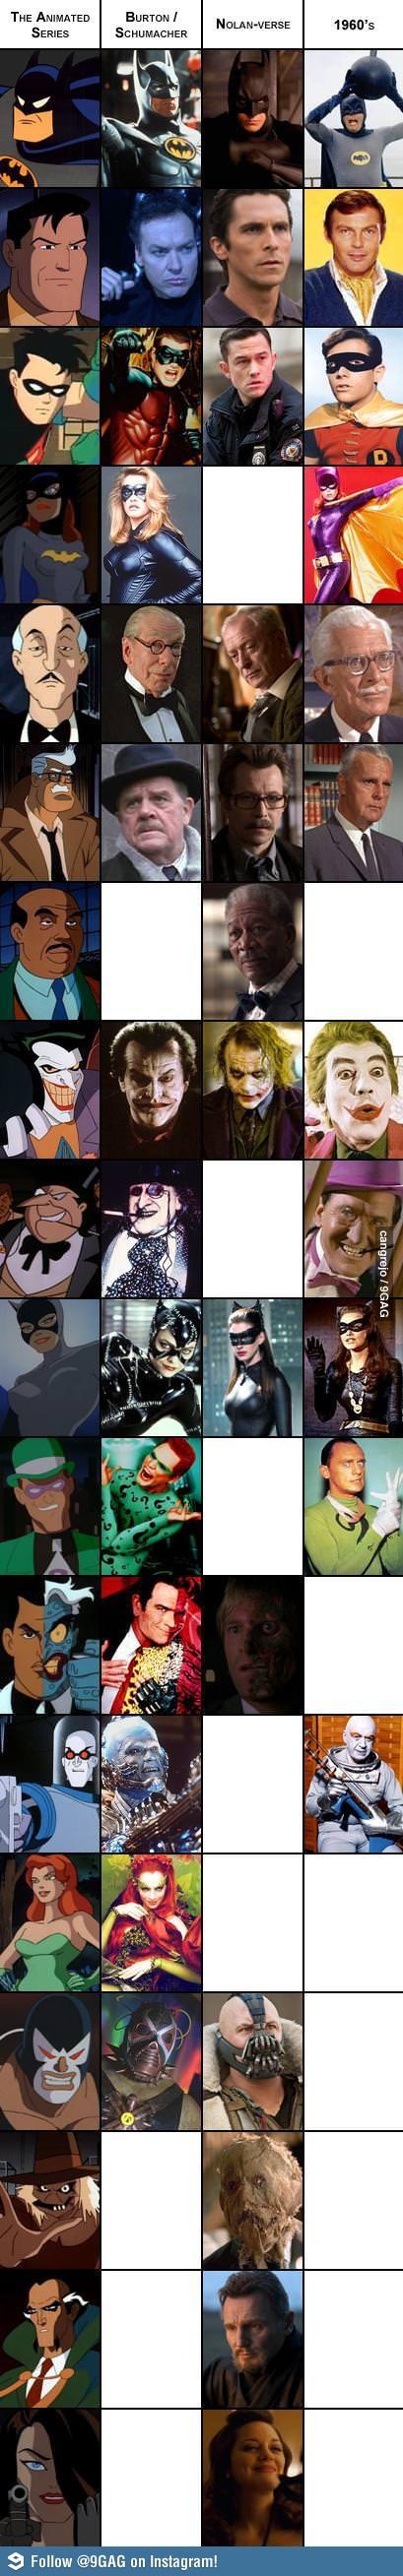 Portrayal of Batman characters. 60s Mr. Freeze hahahaha